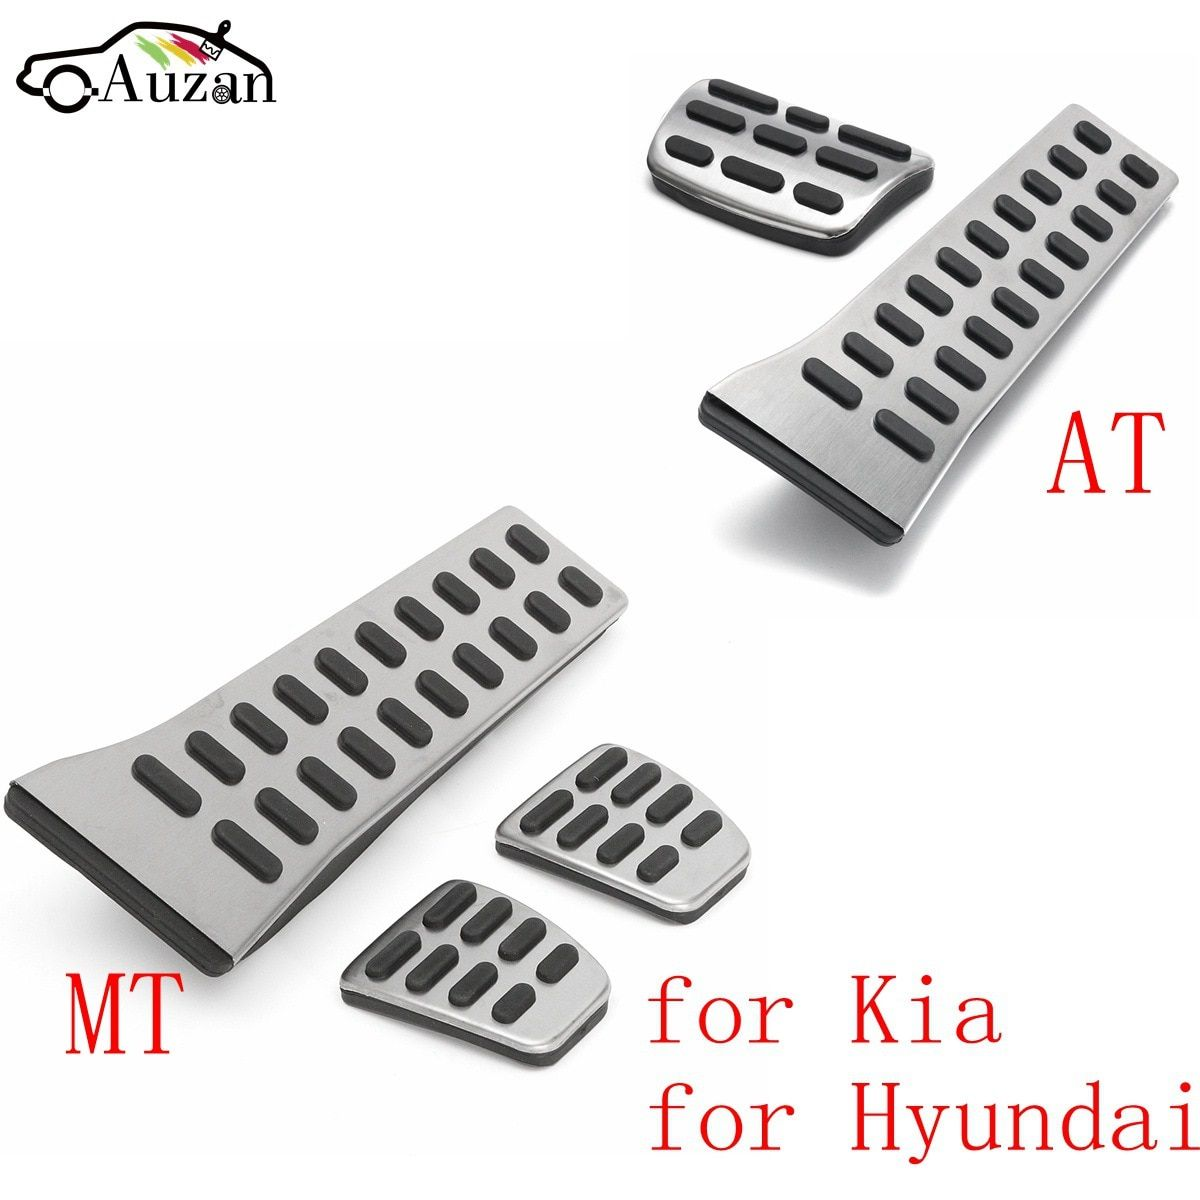 MT AT Car Accelerator Gas Fuel Brake Clutch Foot Pedal Cover For KIA Sportage QL <font><b>2016</b></font> 2018 for Hyundai Sonata Fe